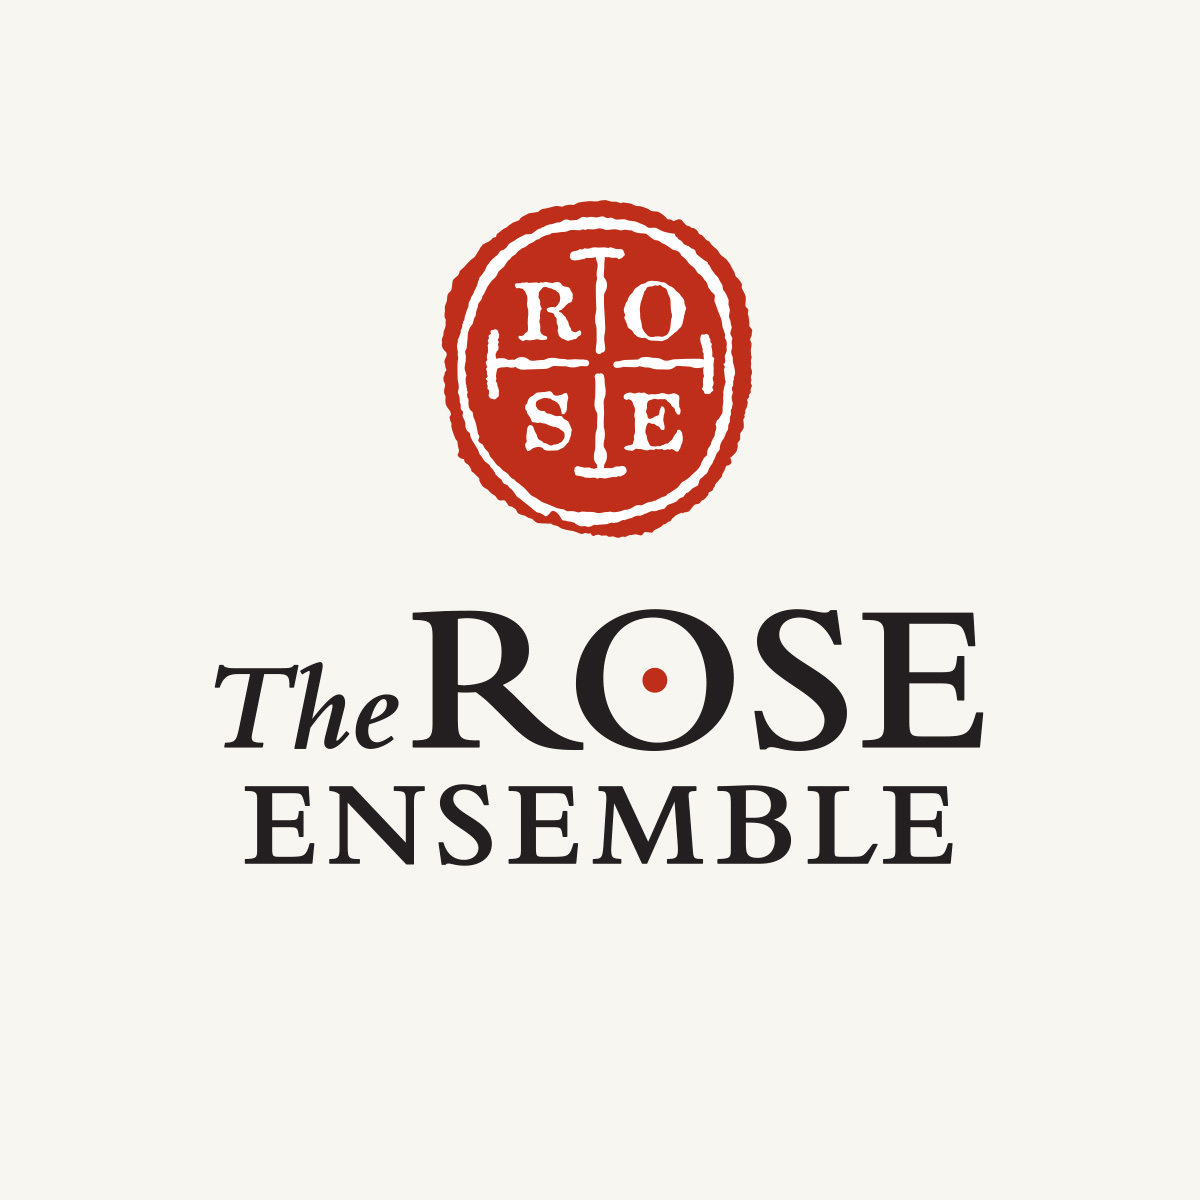 The_Rode_Ensemble.jpg